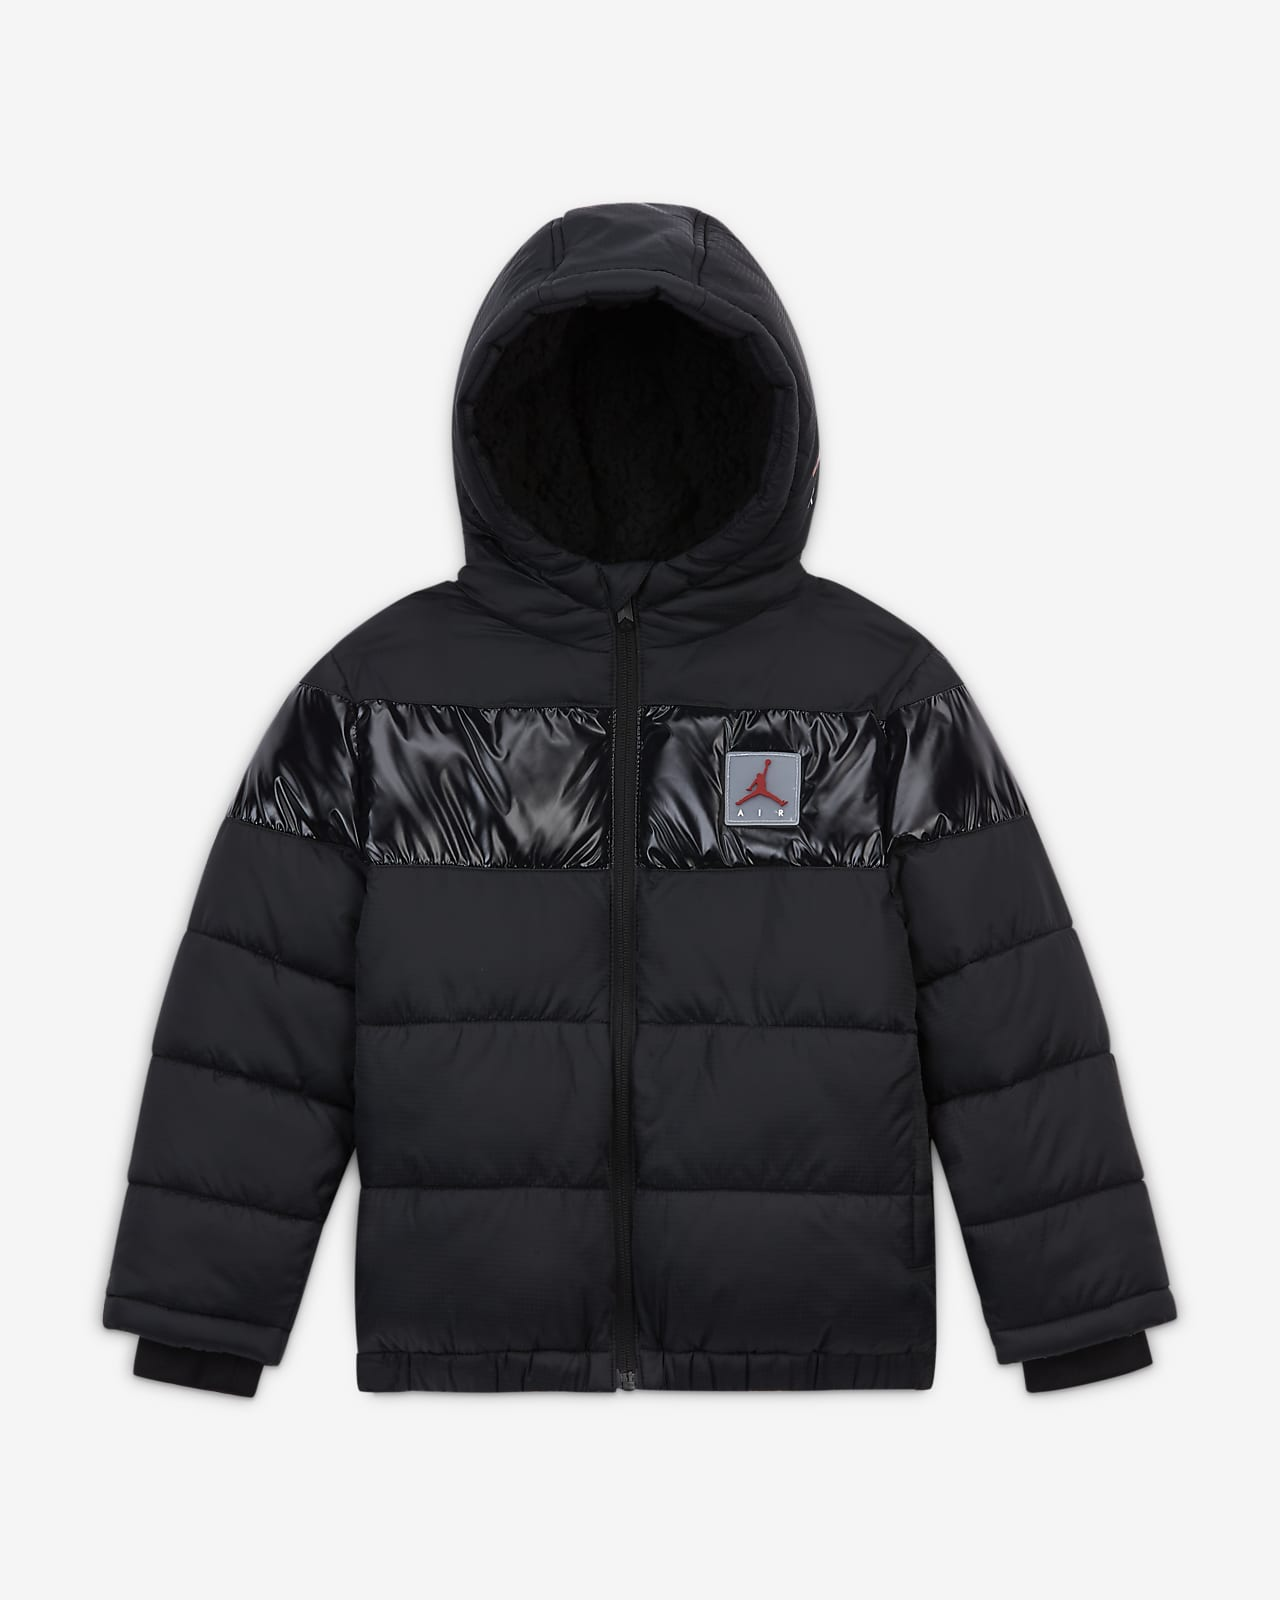 Jordan Puffer-Jacke für jüngere Kinder